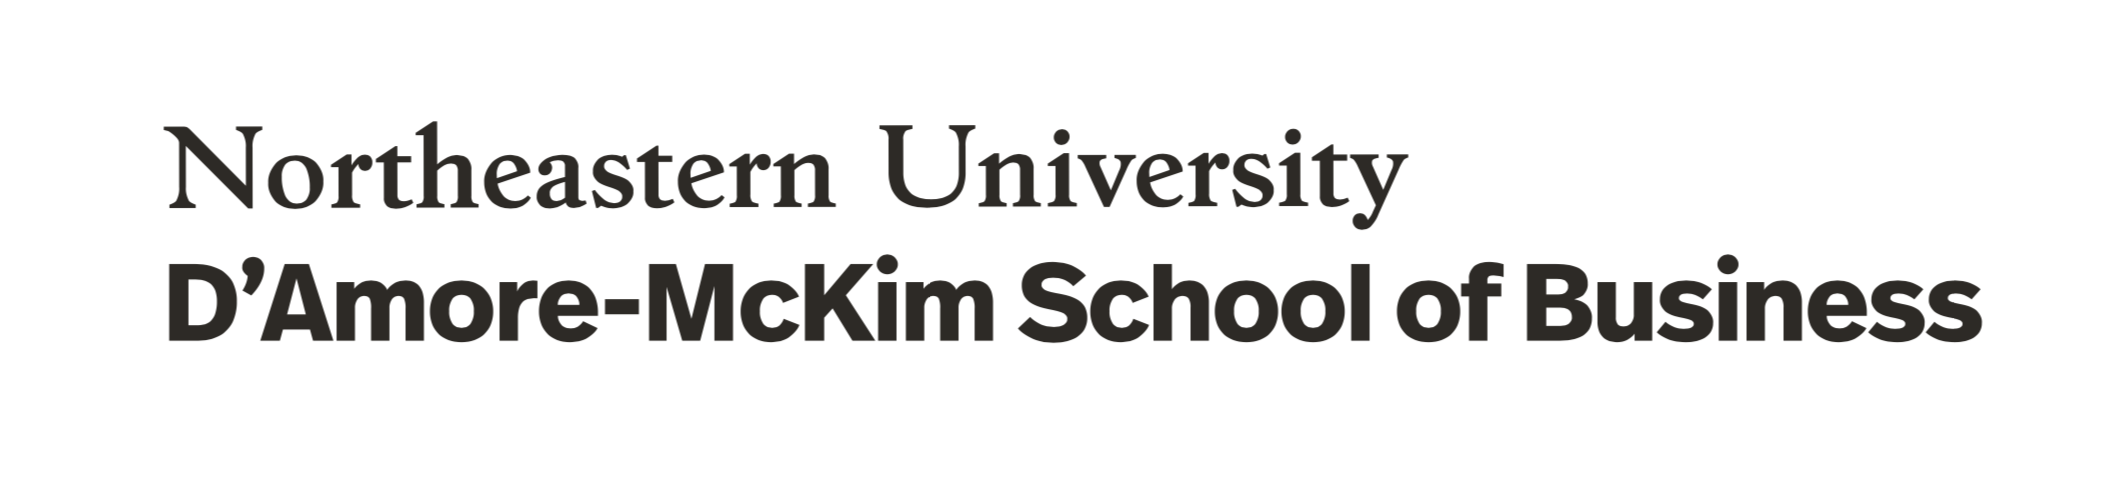 Northeastern University Business School Commencement